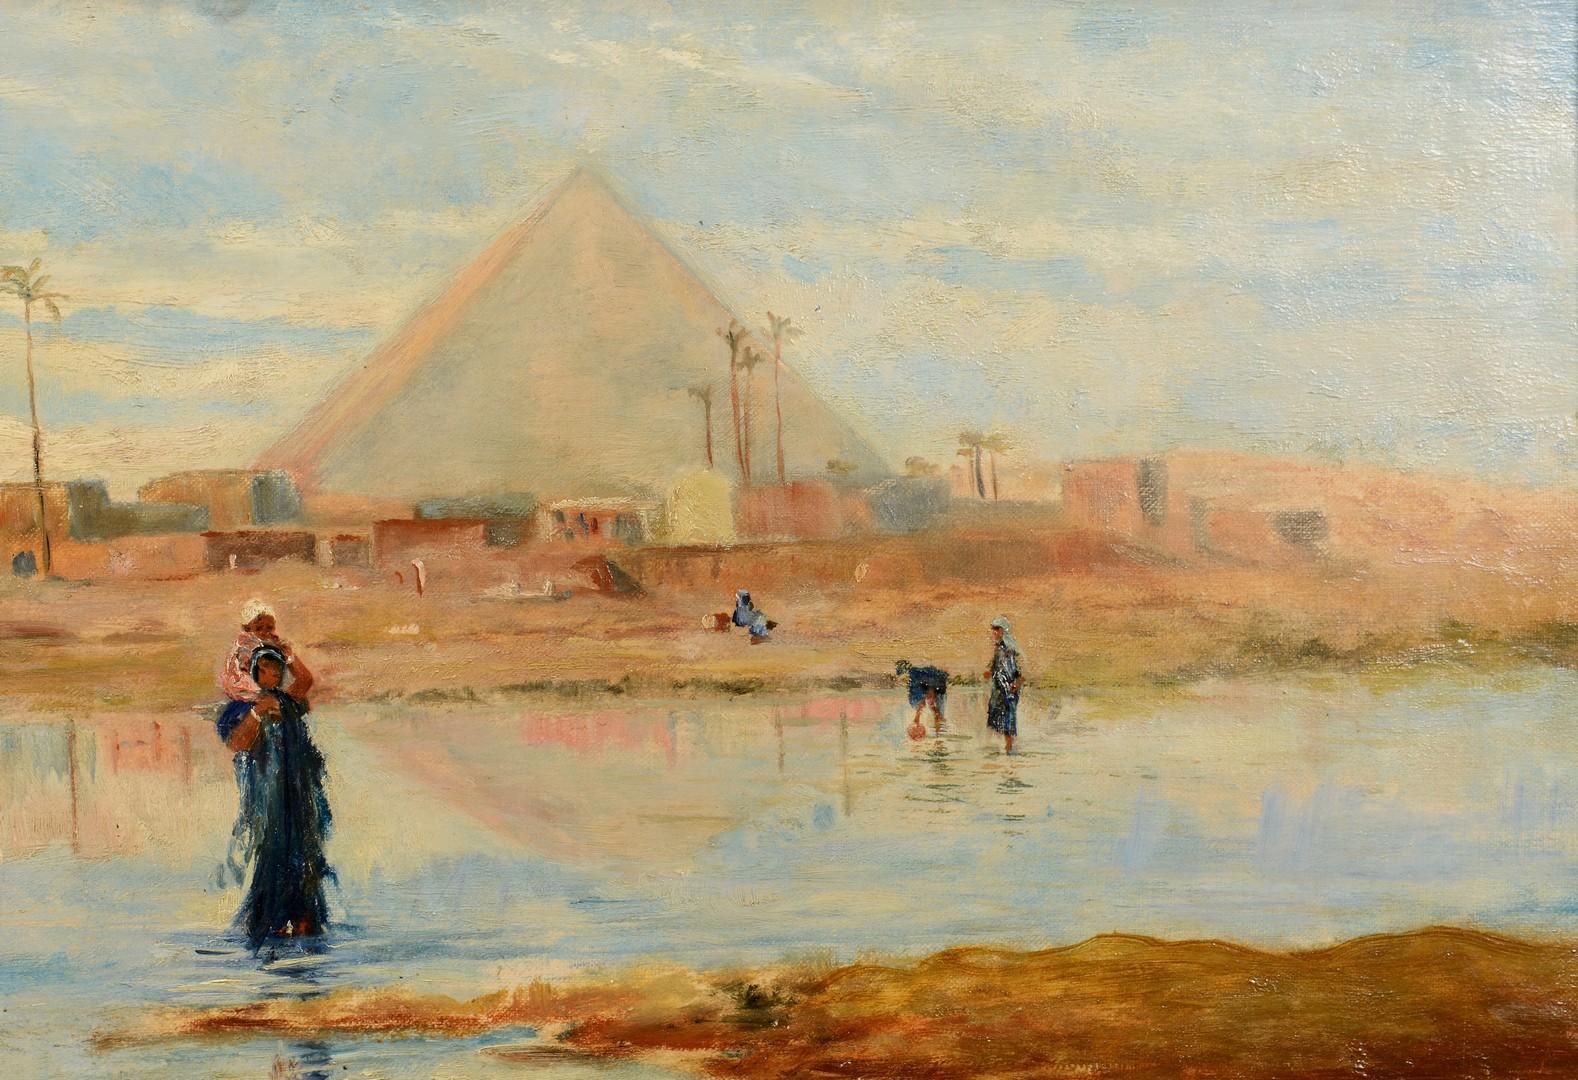 Lot 211: Frederick Goodall Orientalist Oil on Canvas